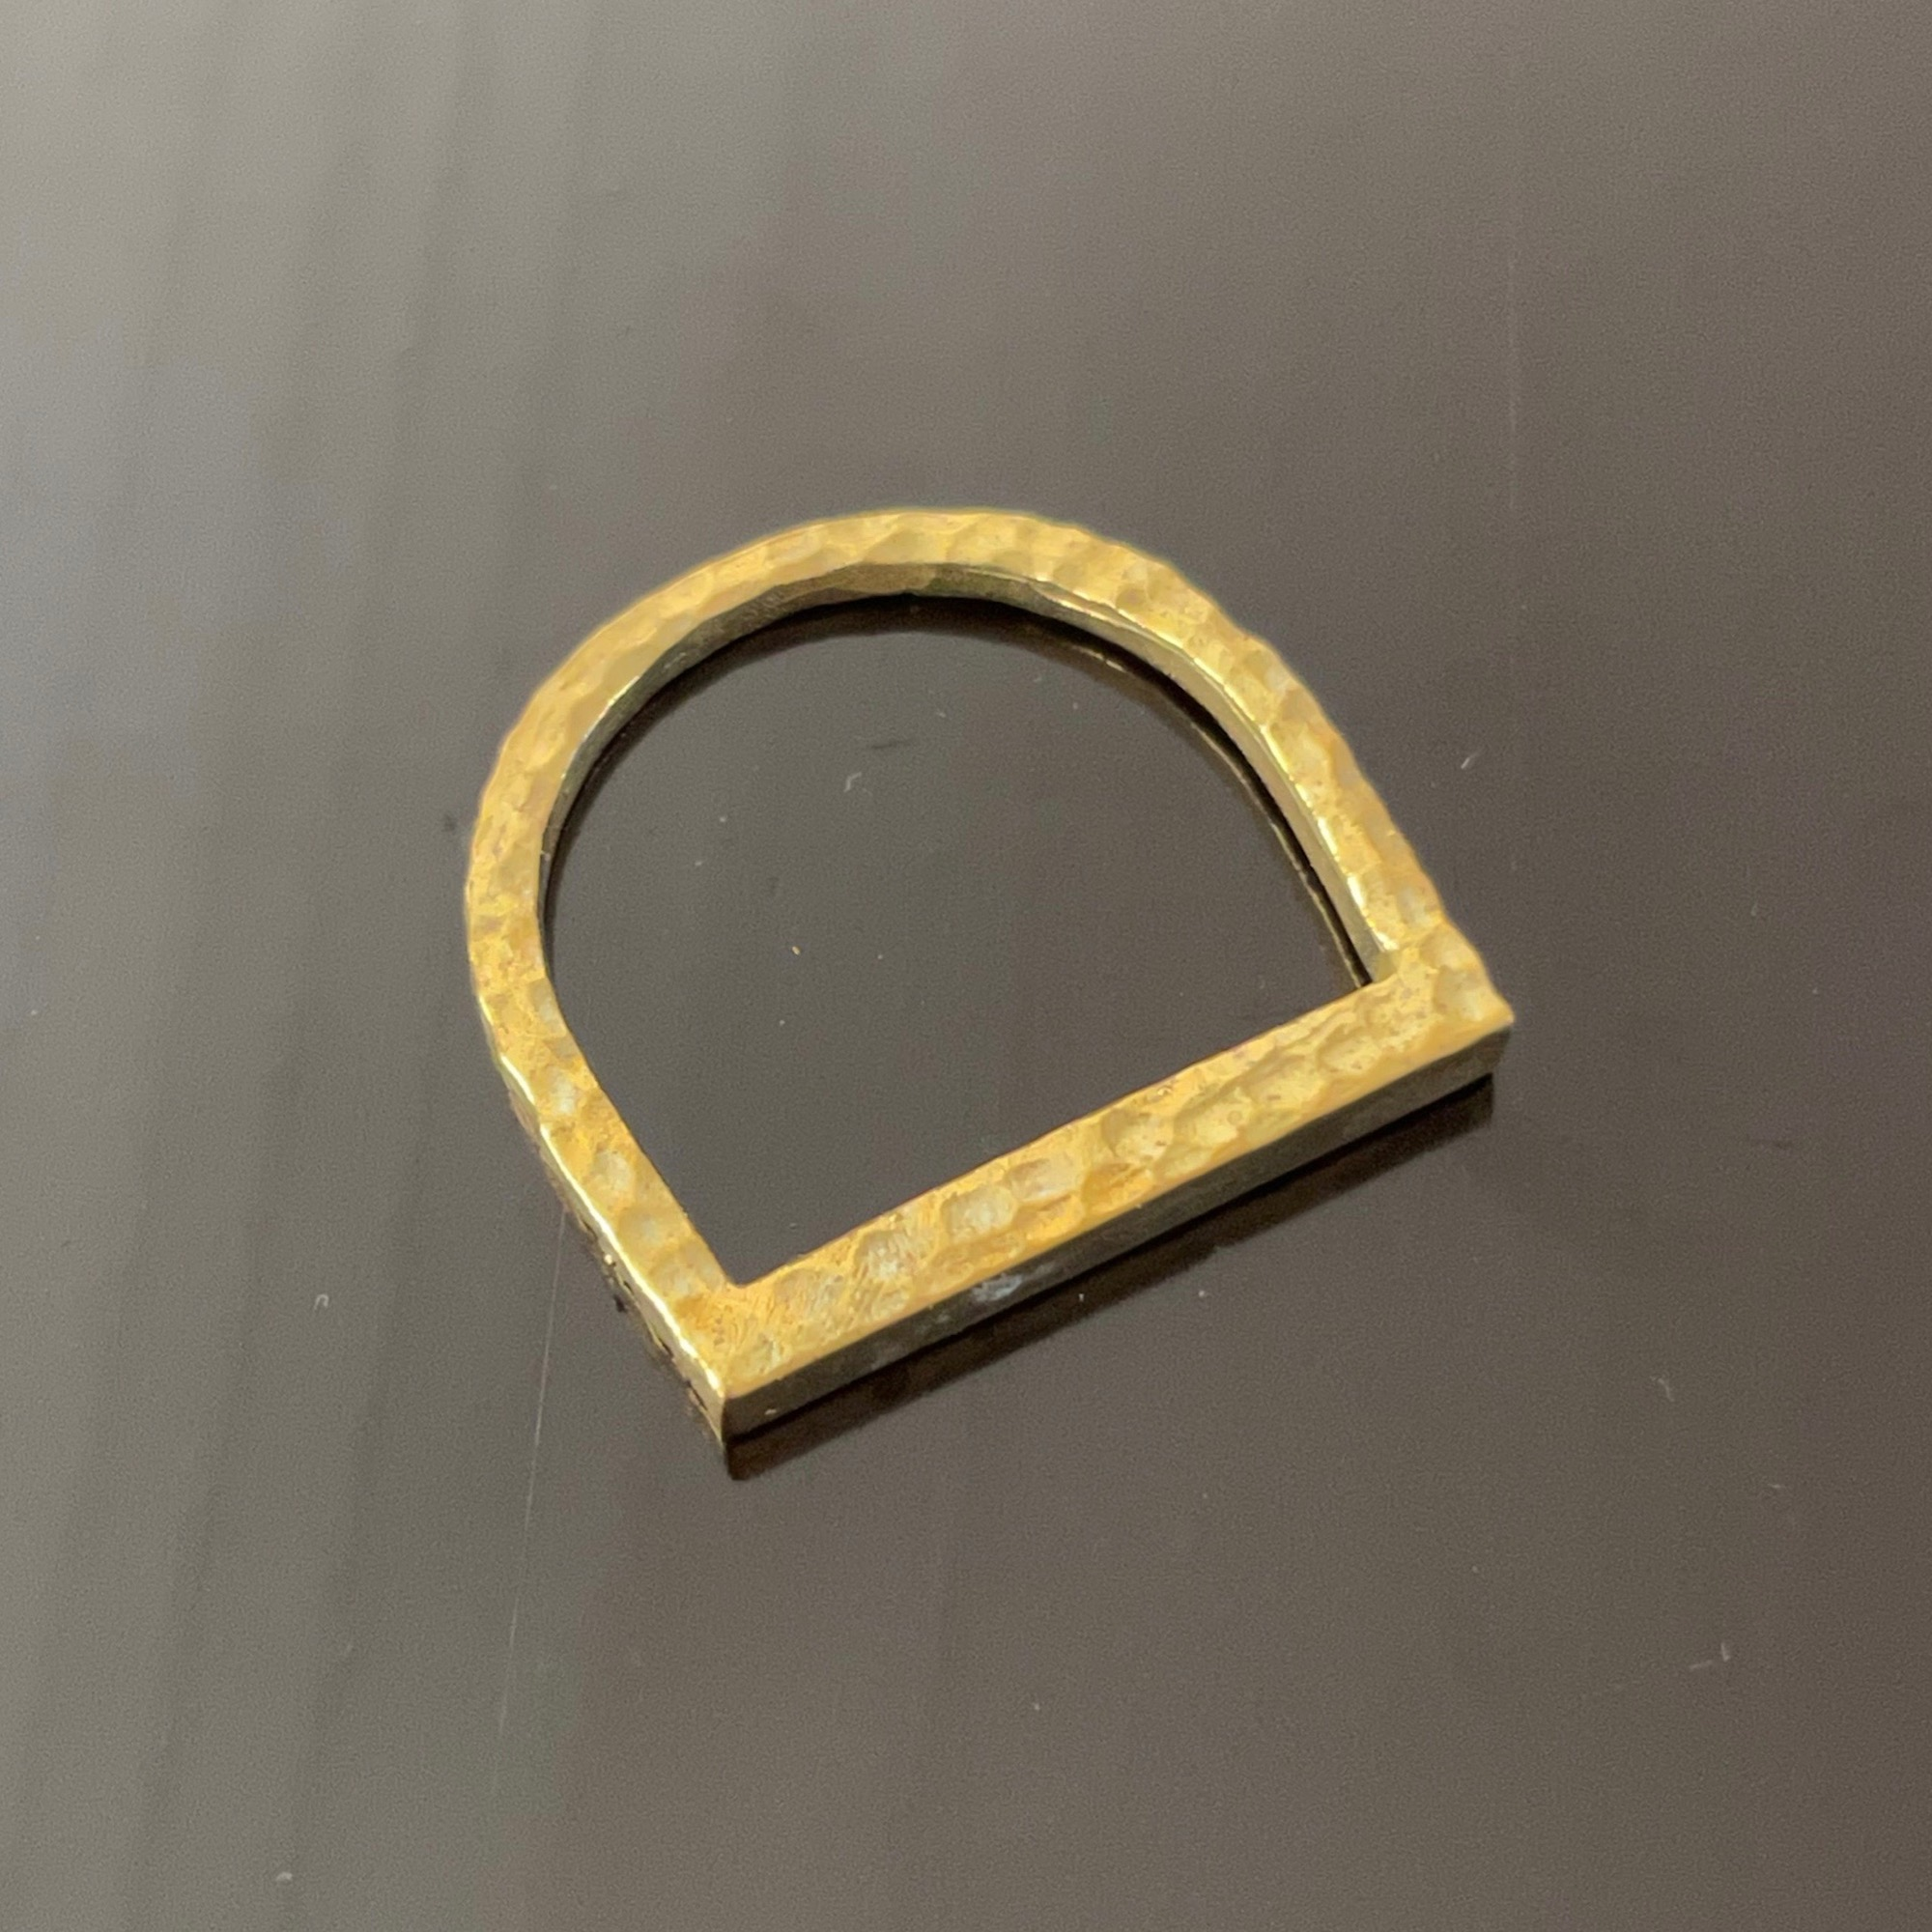 Irth Hammered Brass Stirrup Ring